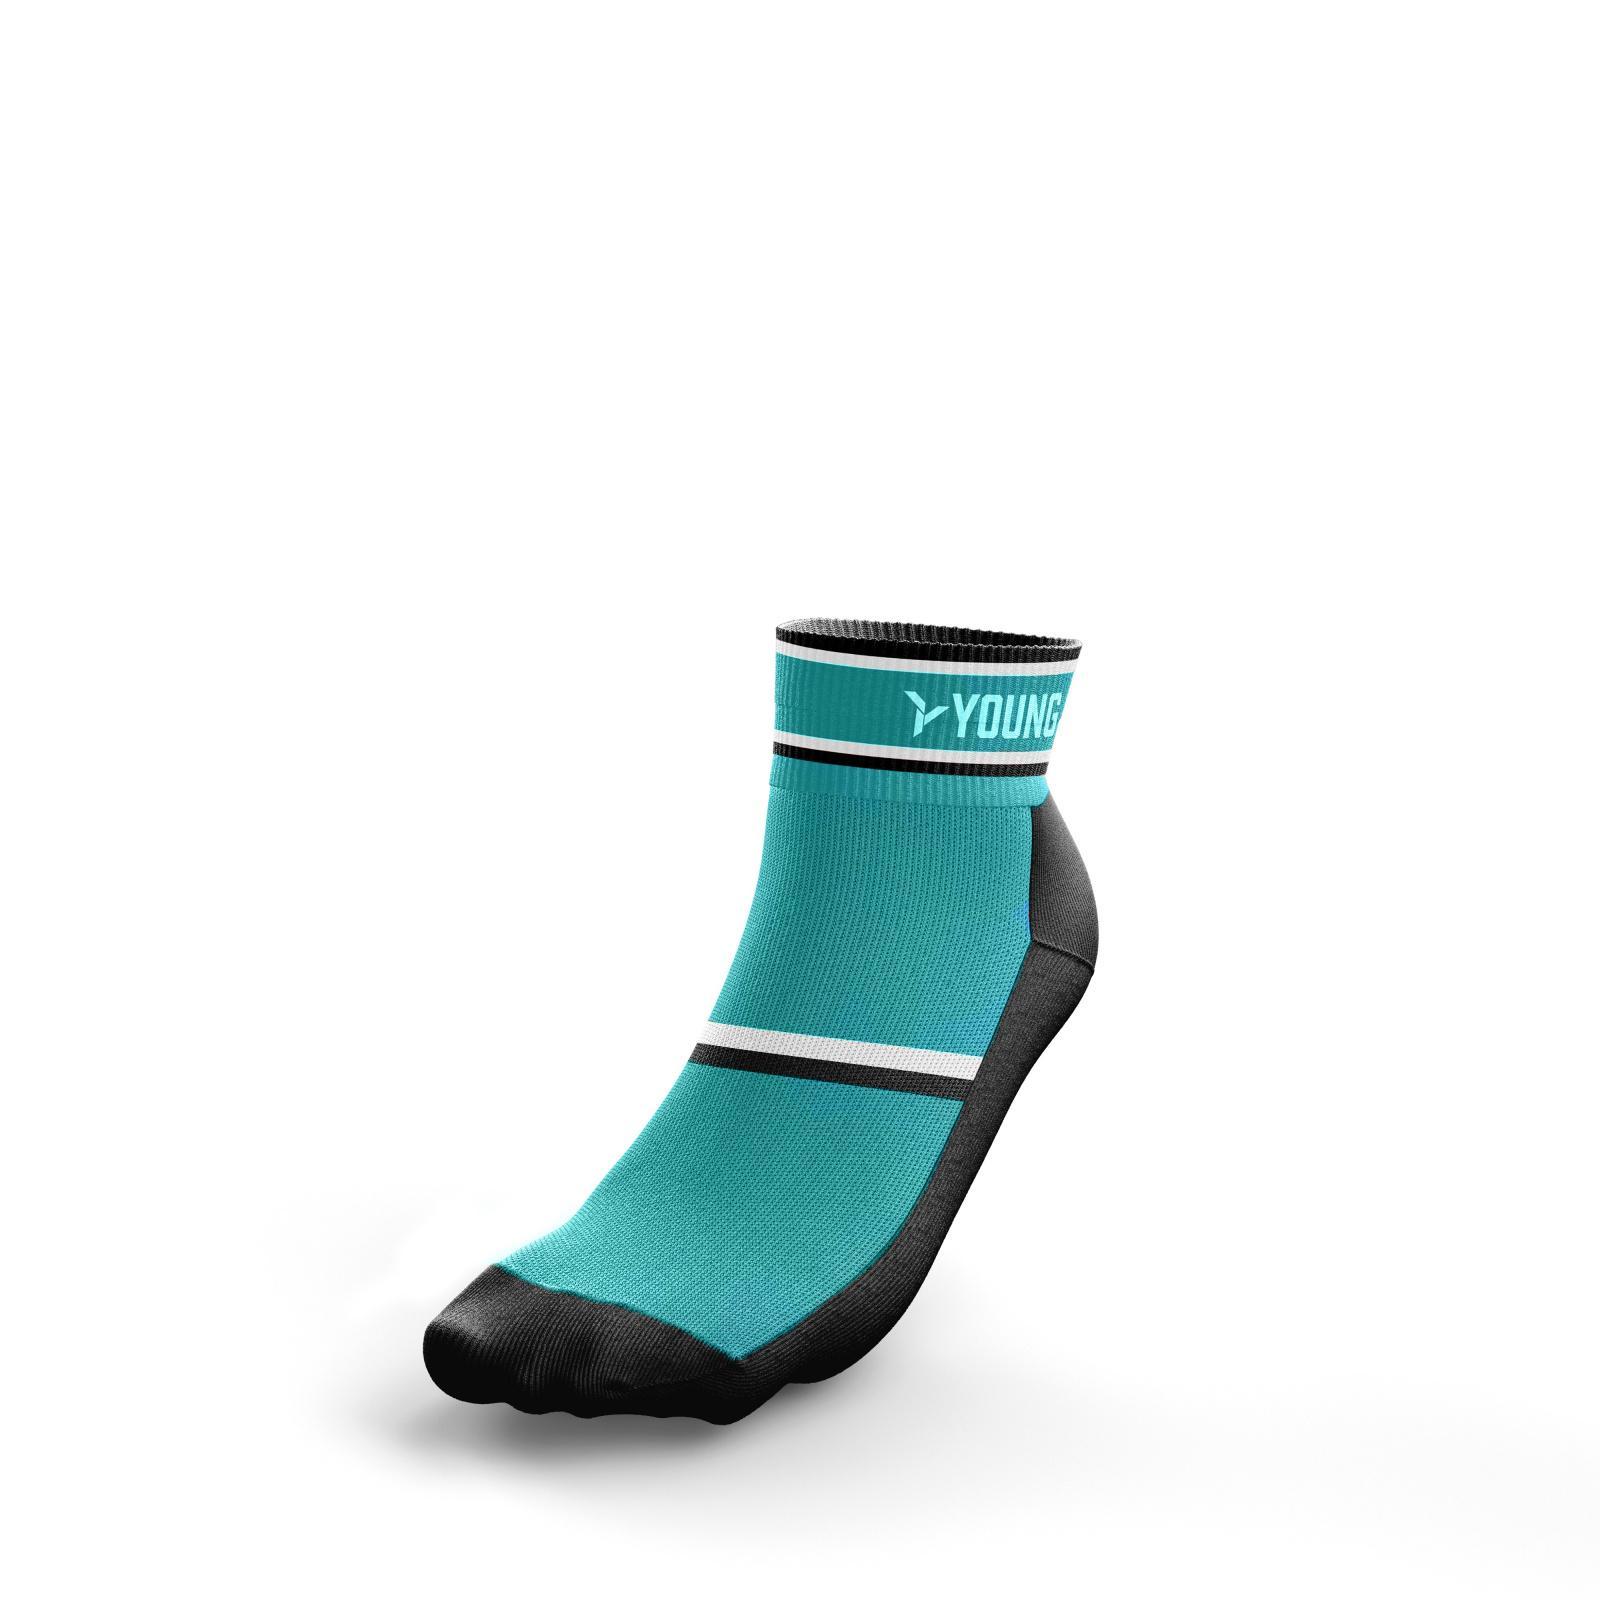 https://www.badec.store/produkty_img/badmintonove-ponozky1570134203L.jpg